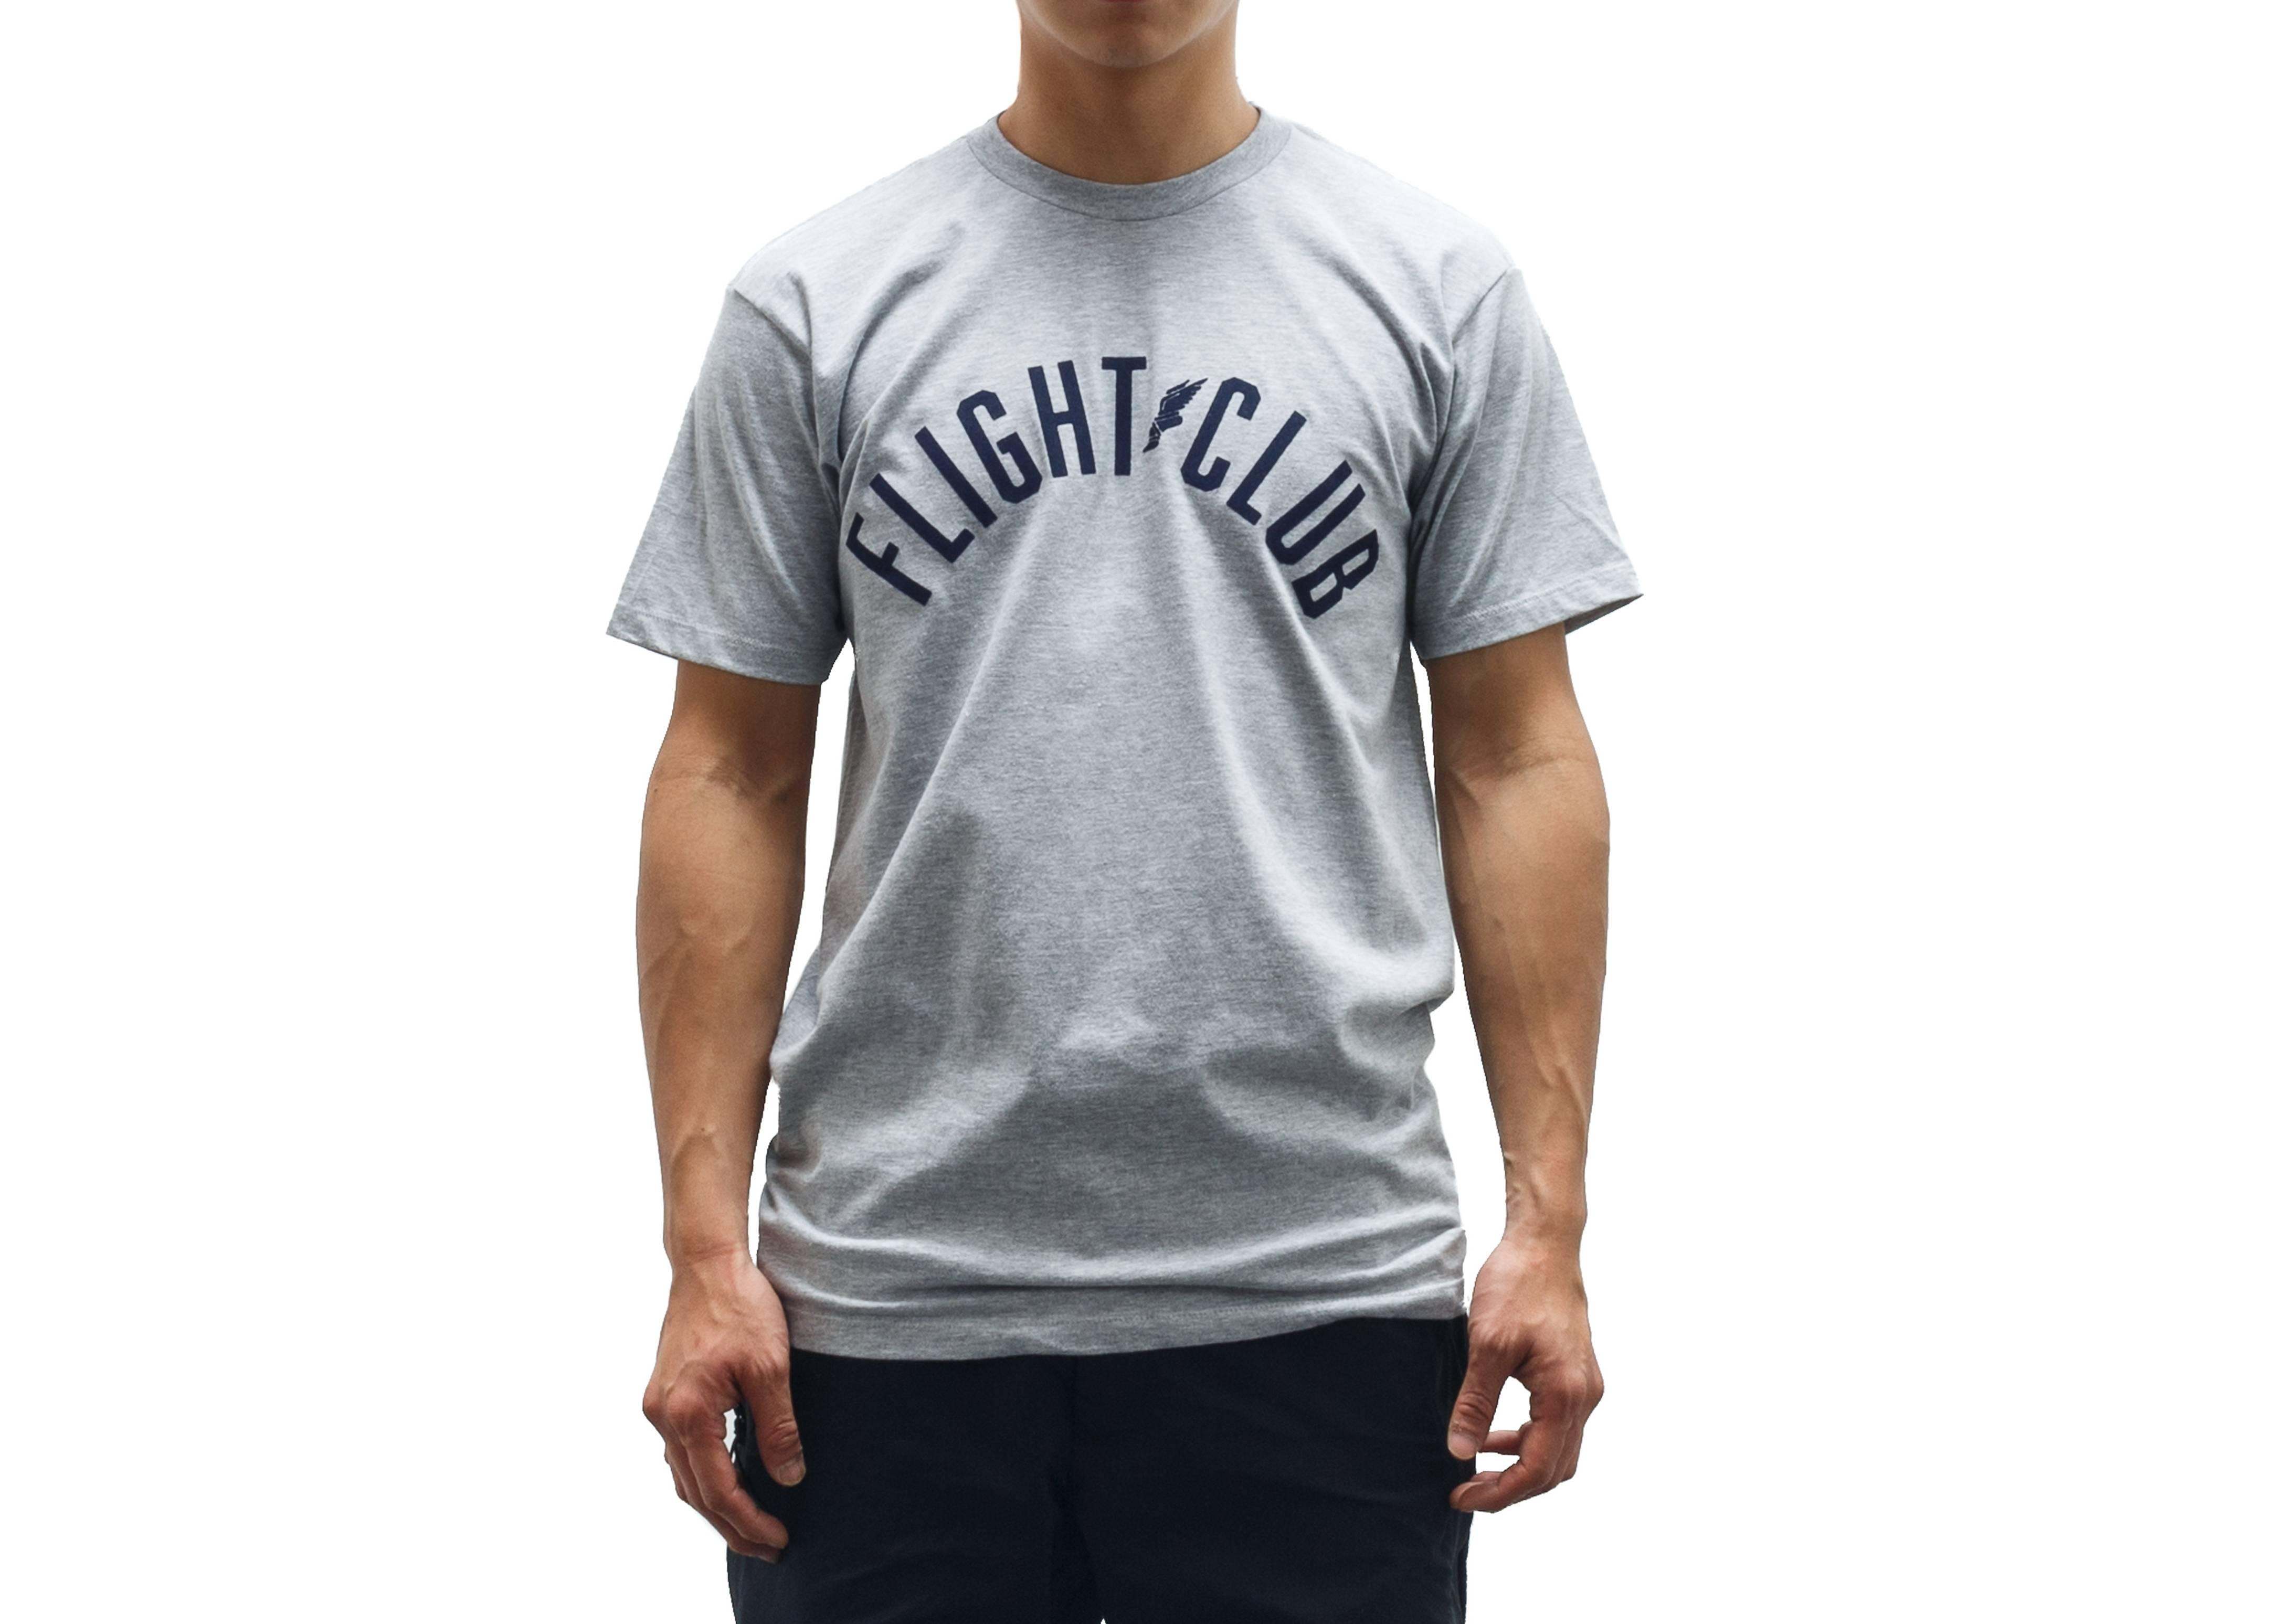 athletic arch logo t-shirt